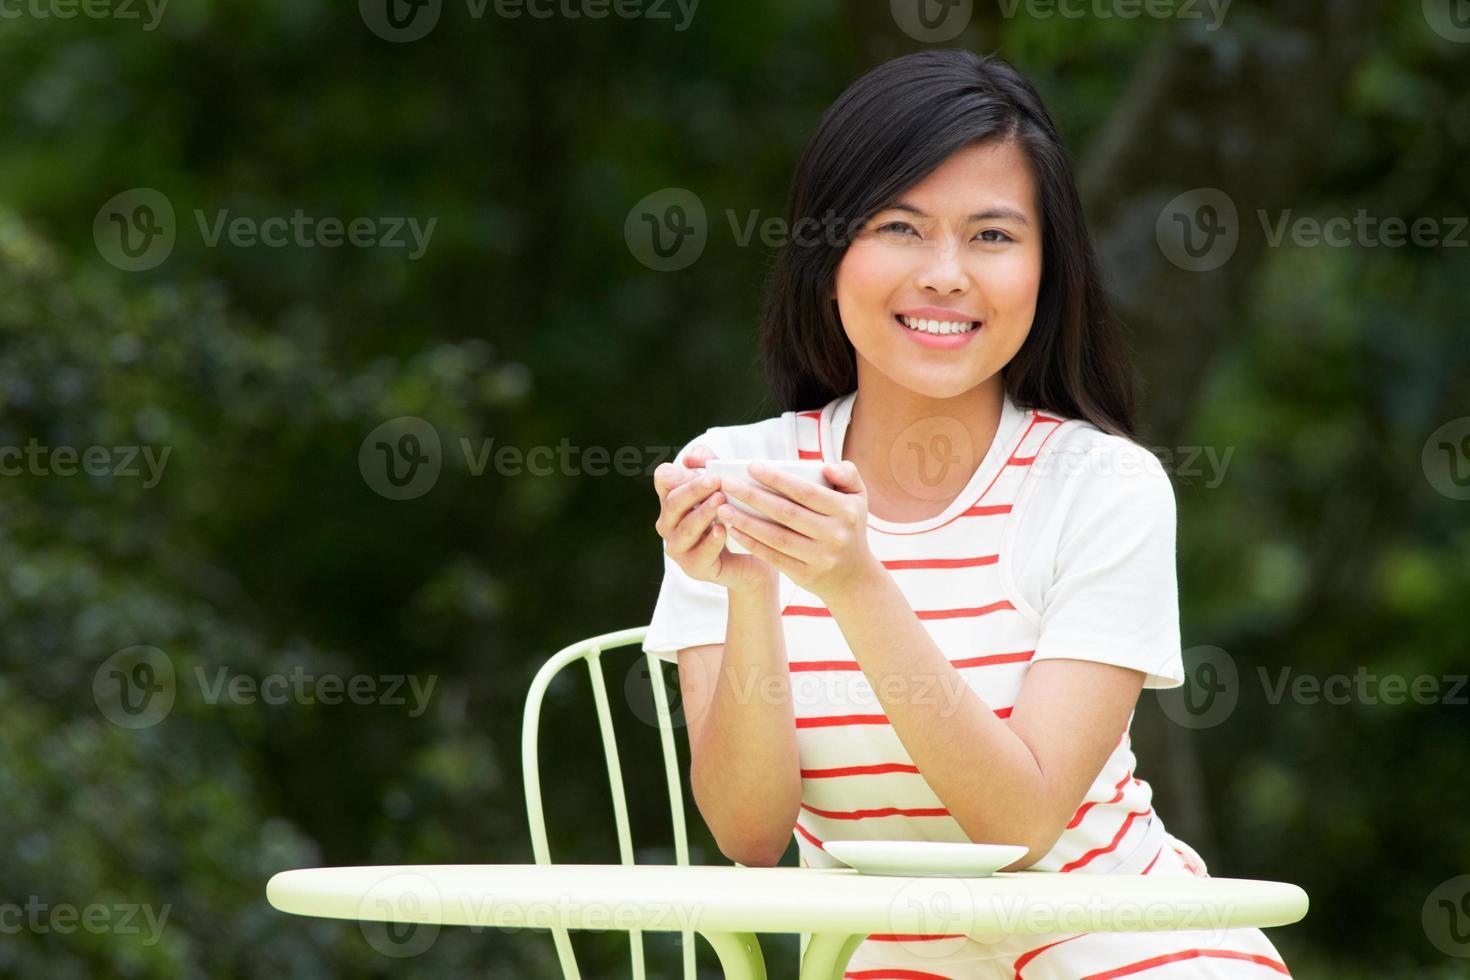 tienermeisje met warme dranken op terras foto